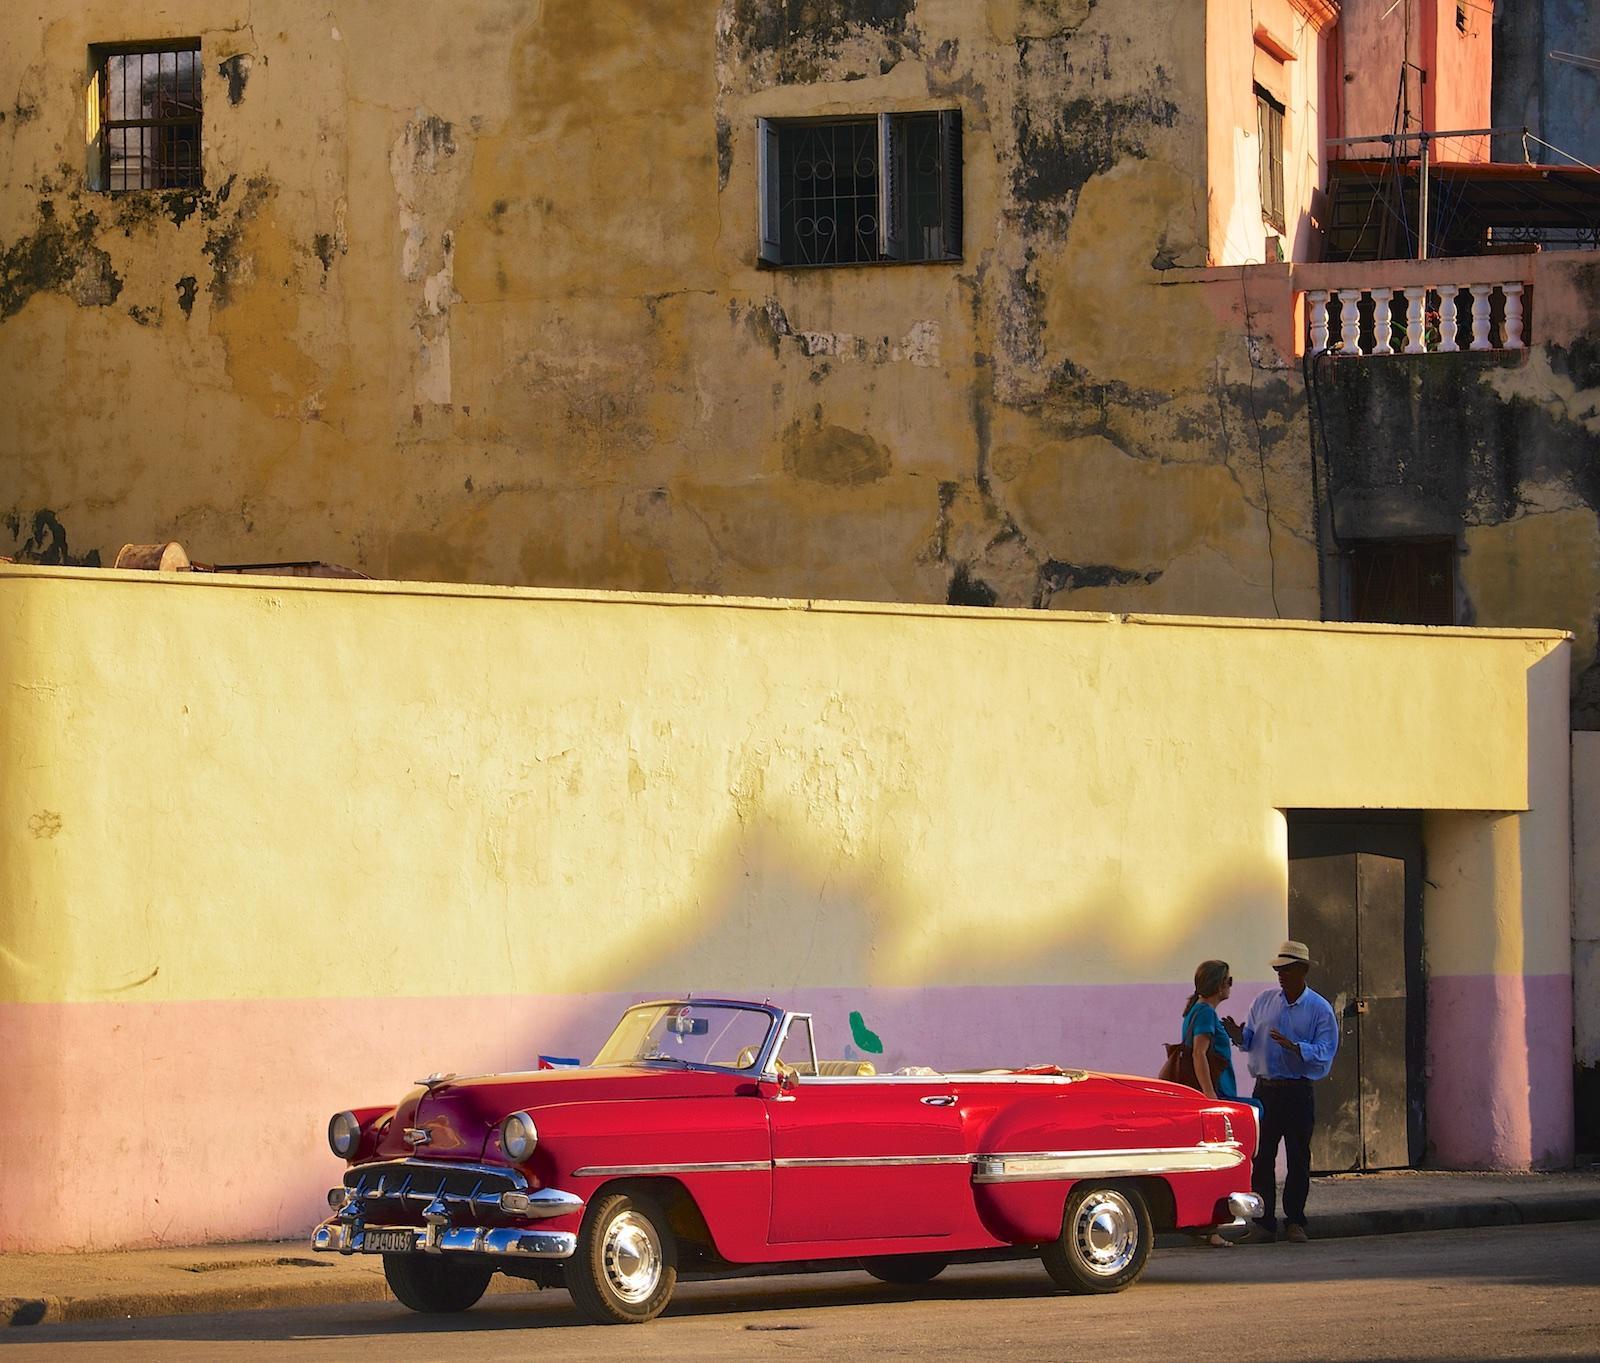 http://thedigitalstory.com/2016/03/22/red-car-cuba.jpg